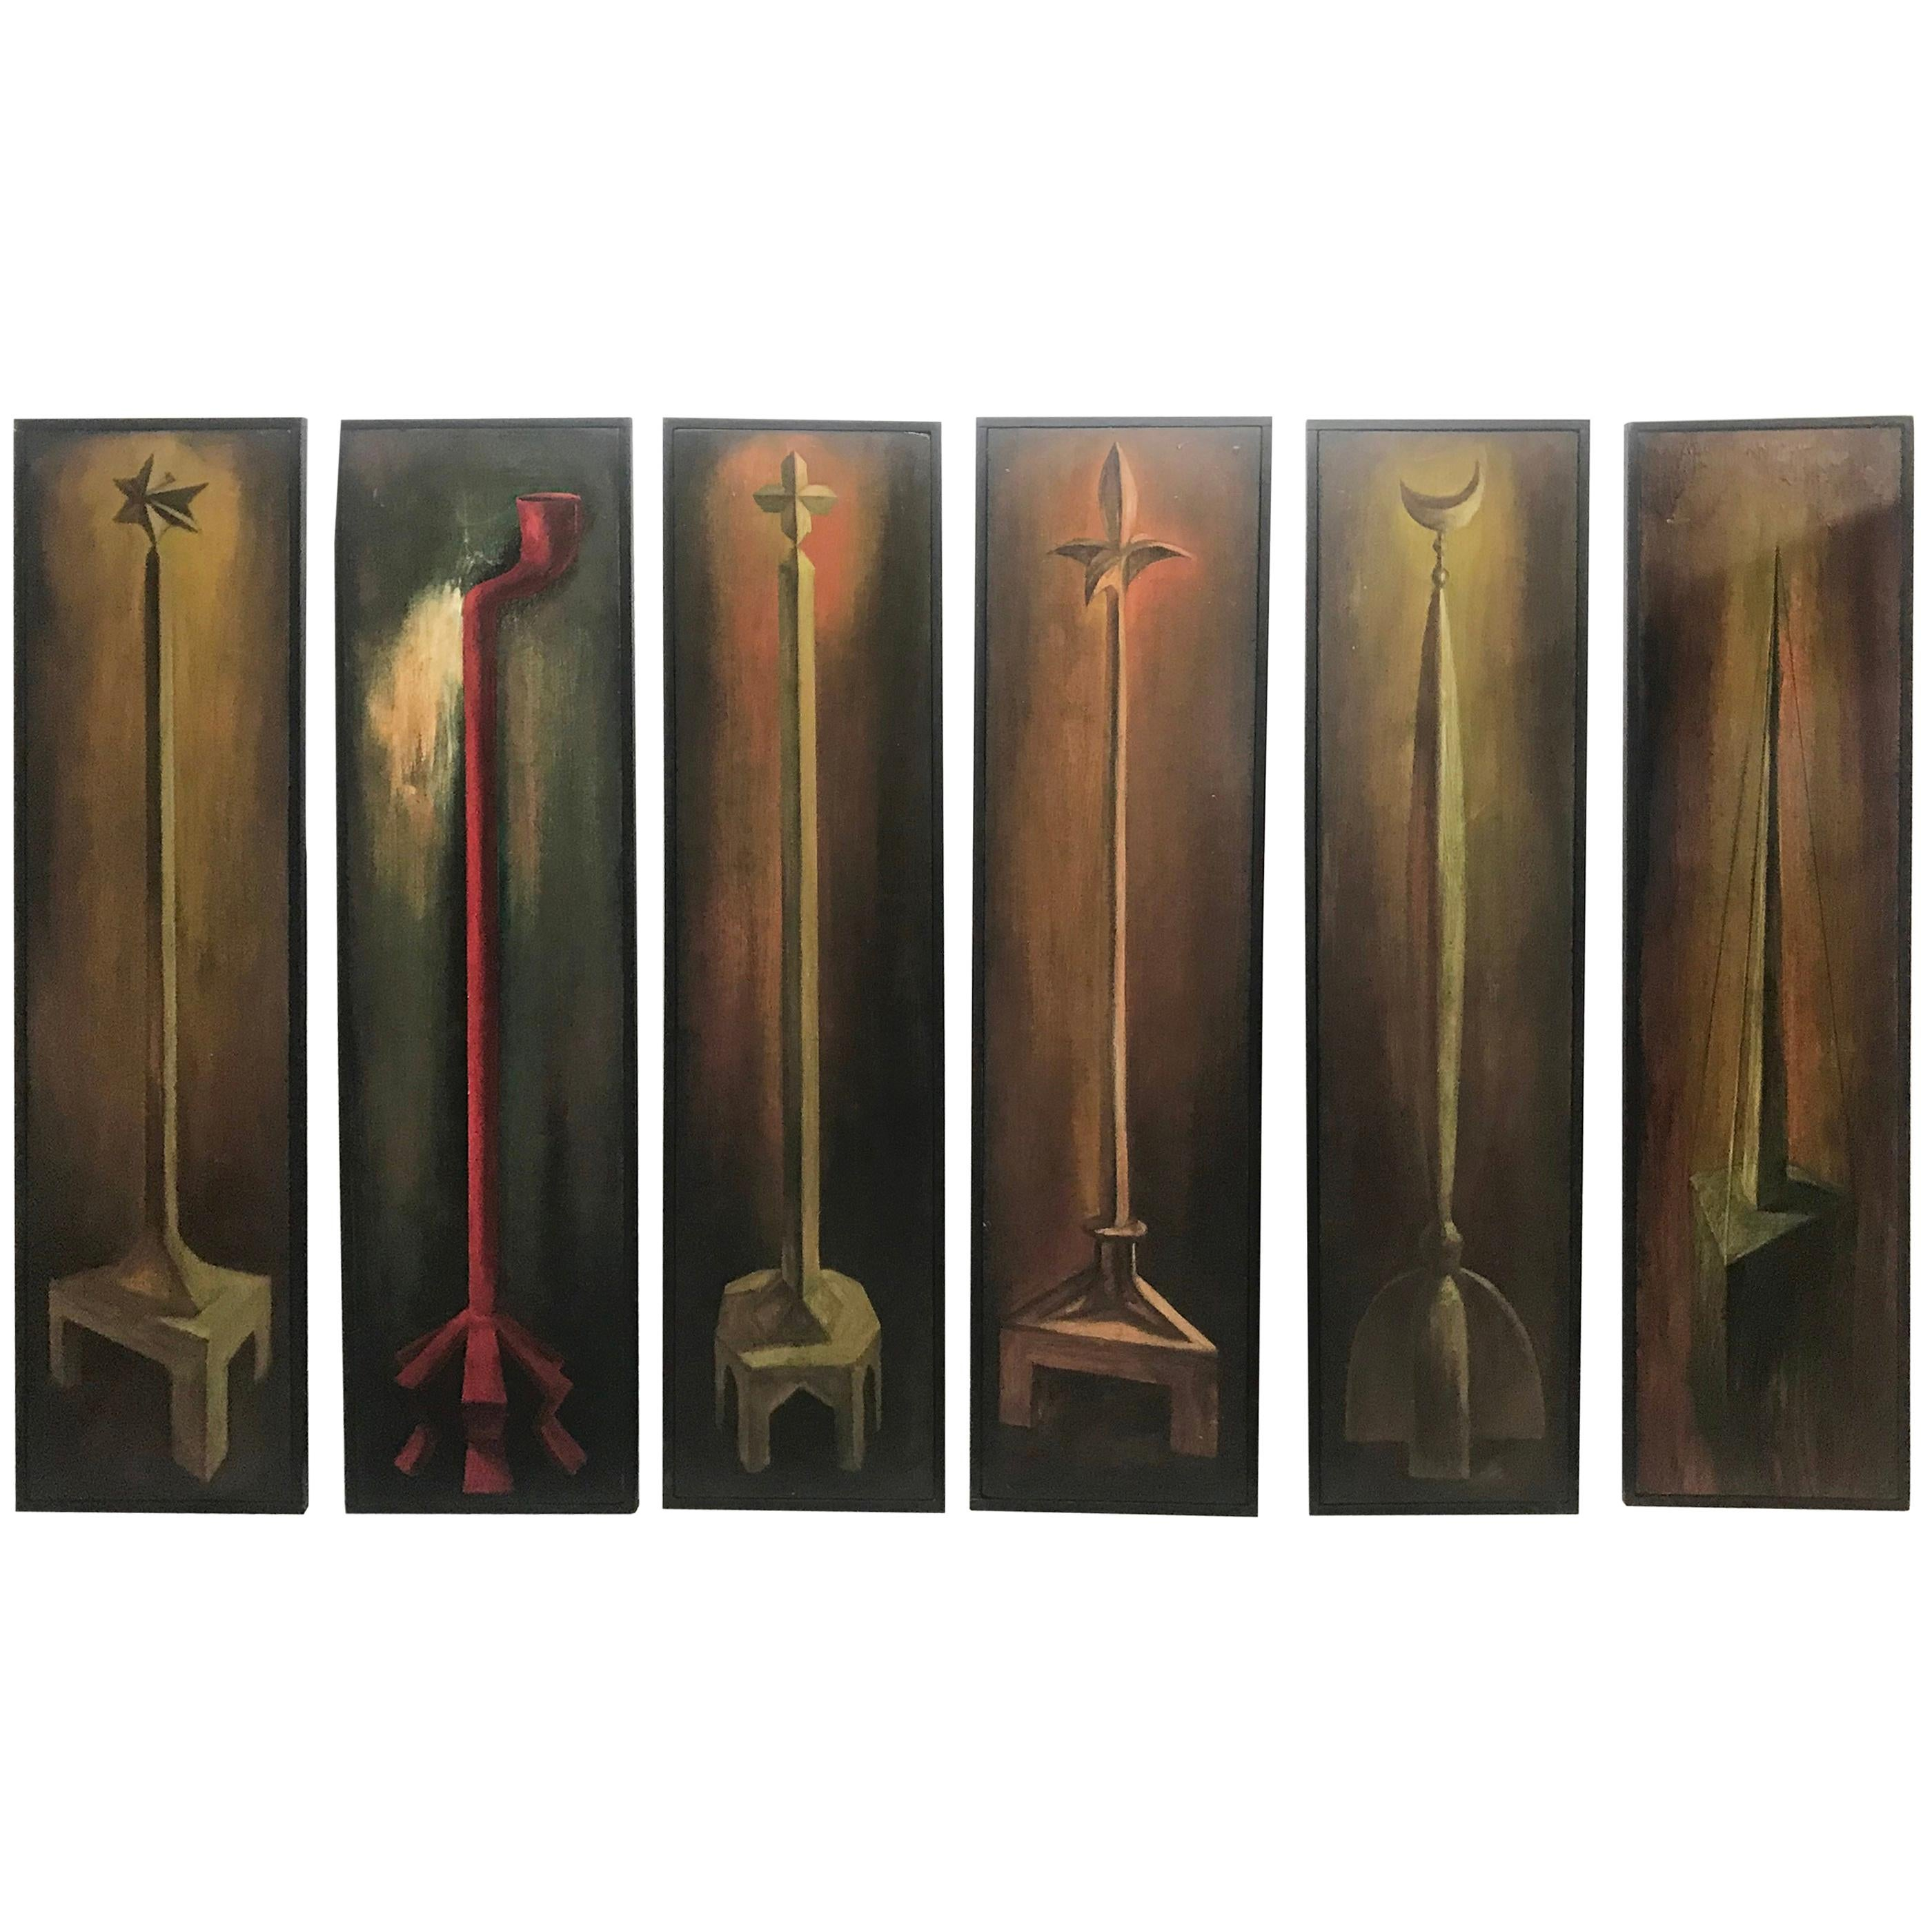 Set of 6 Modernist Folk Art Oil on Wood Paintings Hand Executed by Endi Poskovic